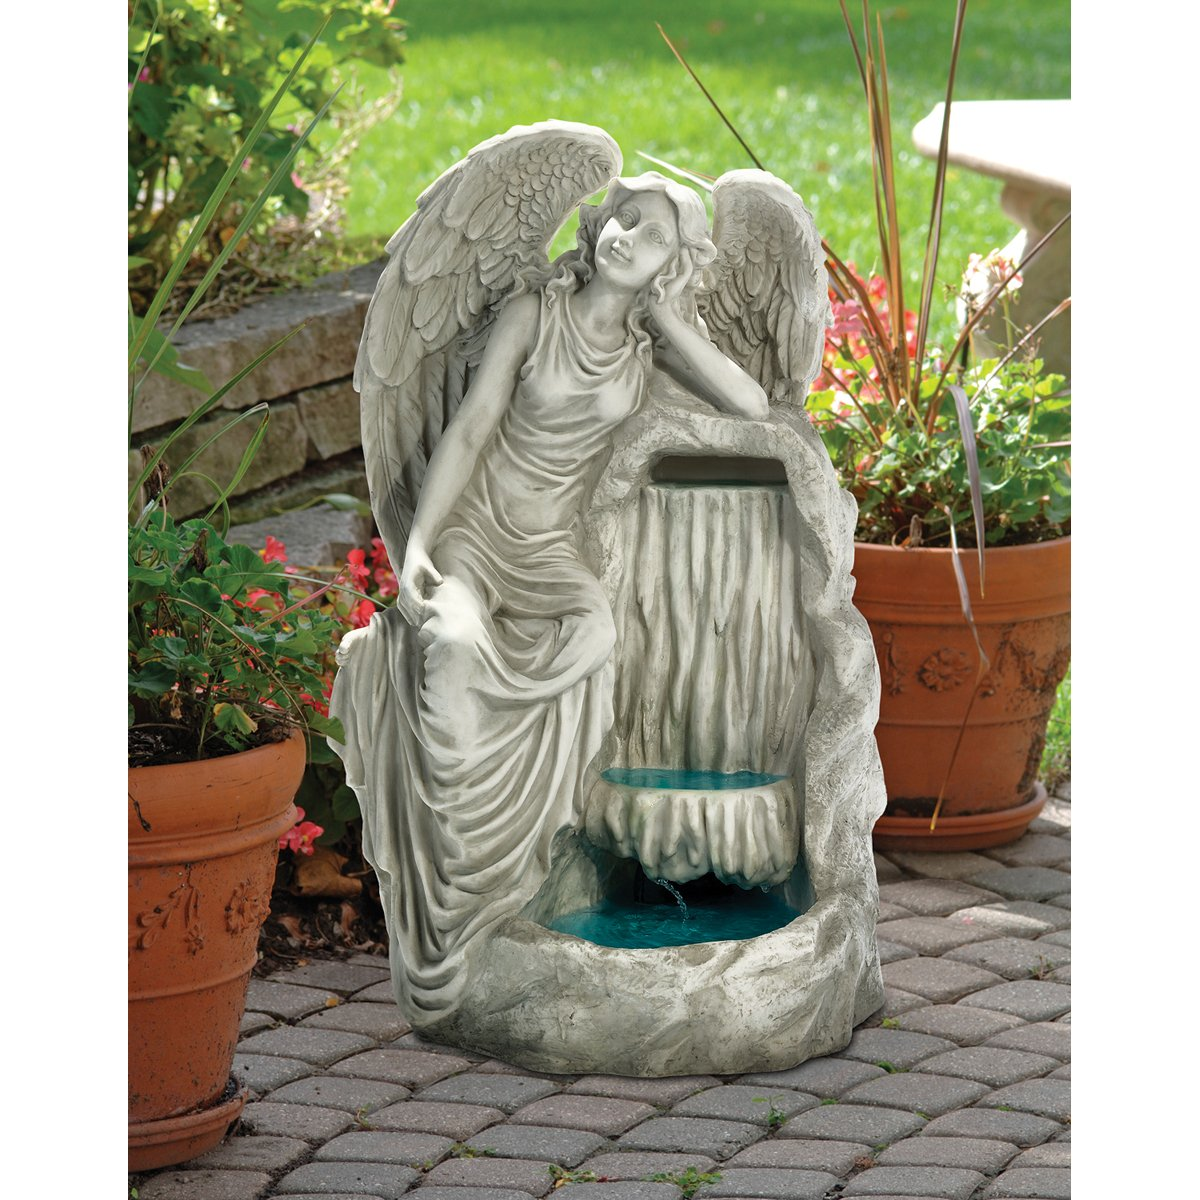 Design Toscano Resting Grace Angel Garden Fountain by Design Toscano